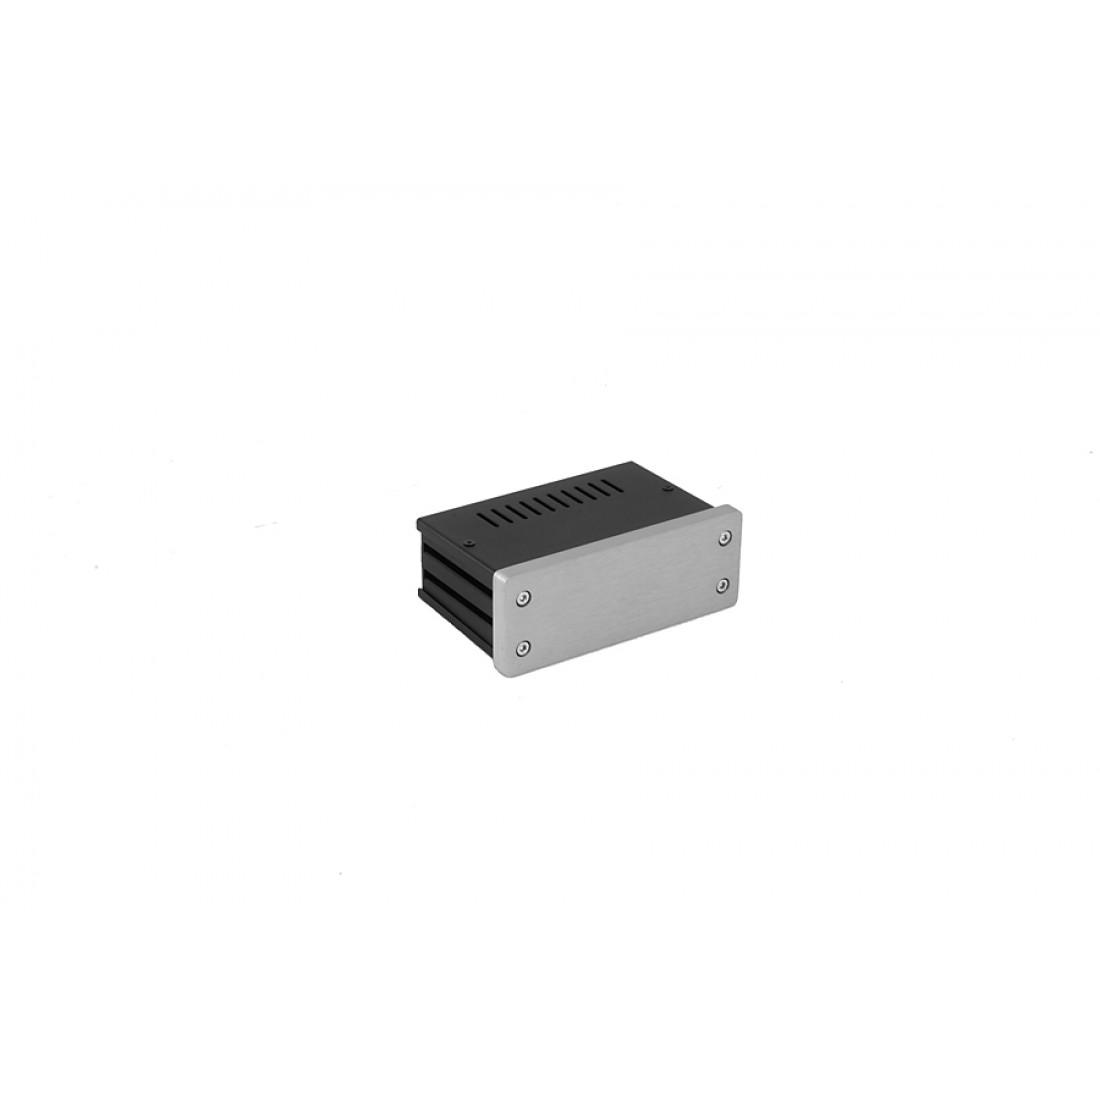 1NGX140 - 1U Galaxy krabice, 124 x 73 x 40mm, 10mm panel stříbrný, Fe víka